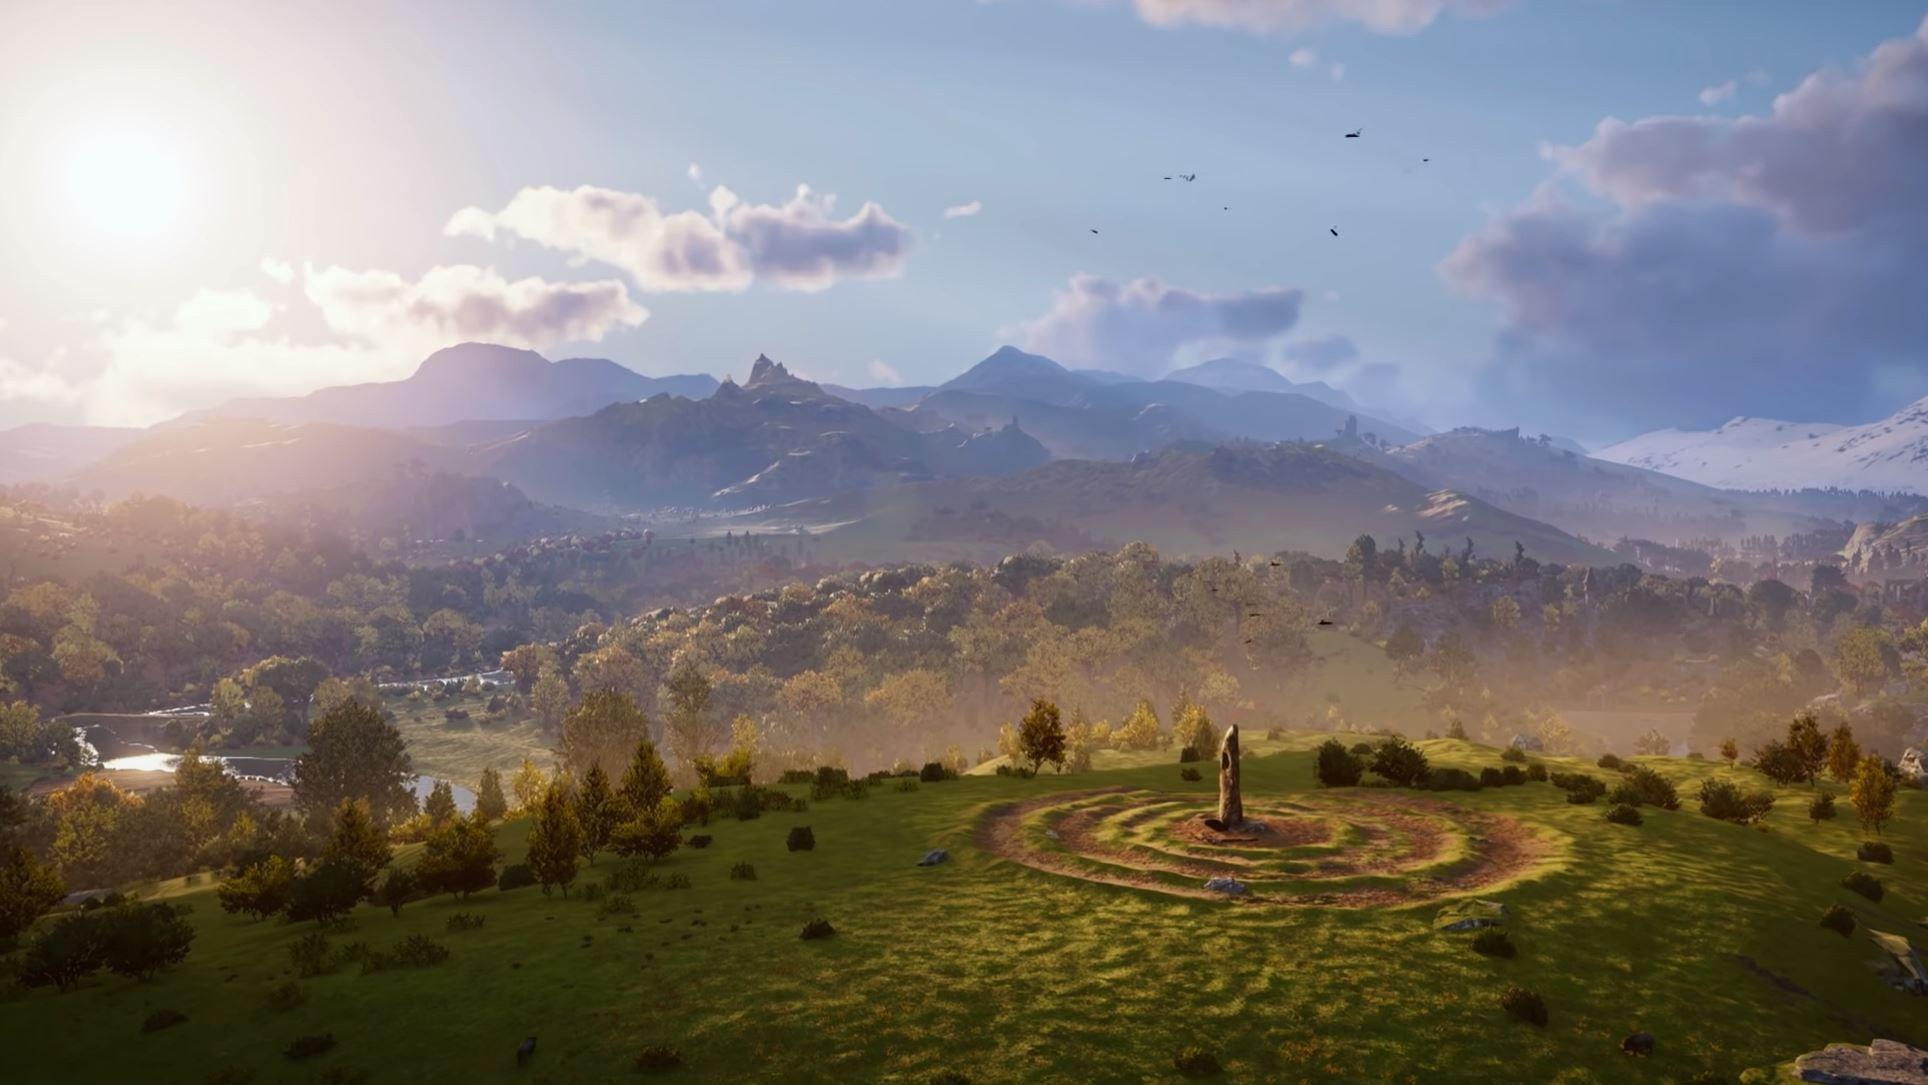 Assassin's Creed Valhalla var blant spillene som ble vist frem i større detalj under Microsofts Inside Xbox-arrangement torsdag.